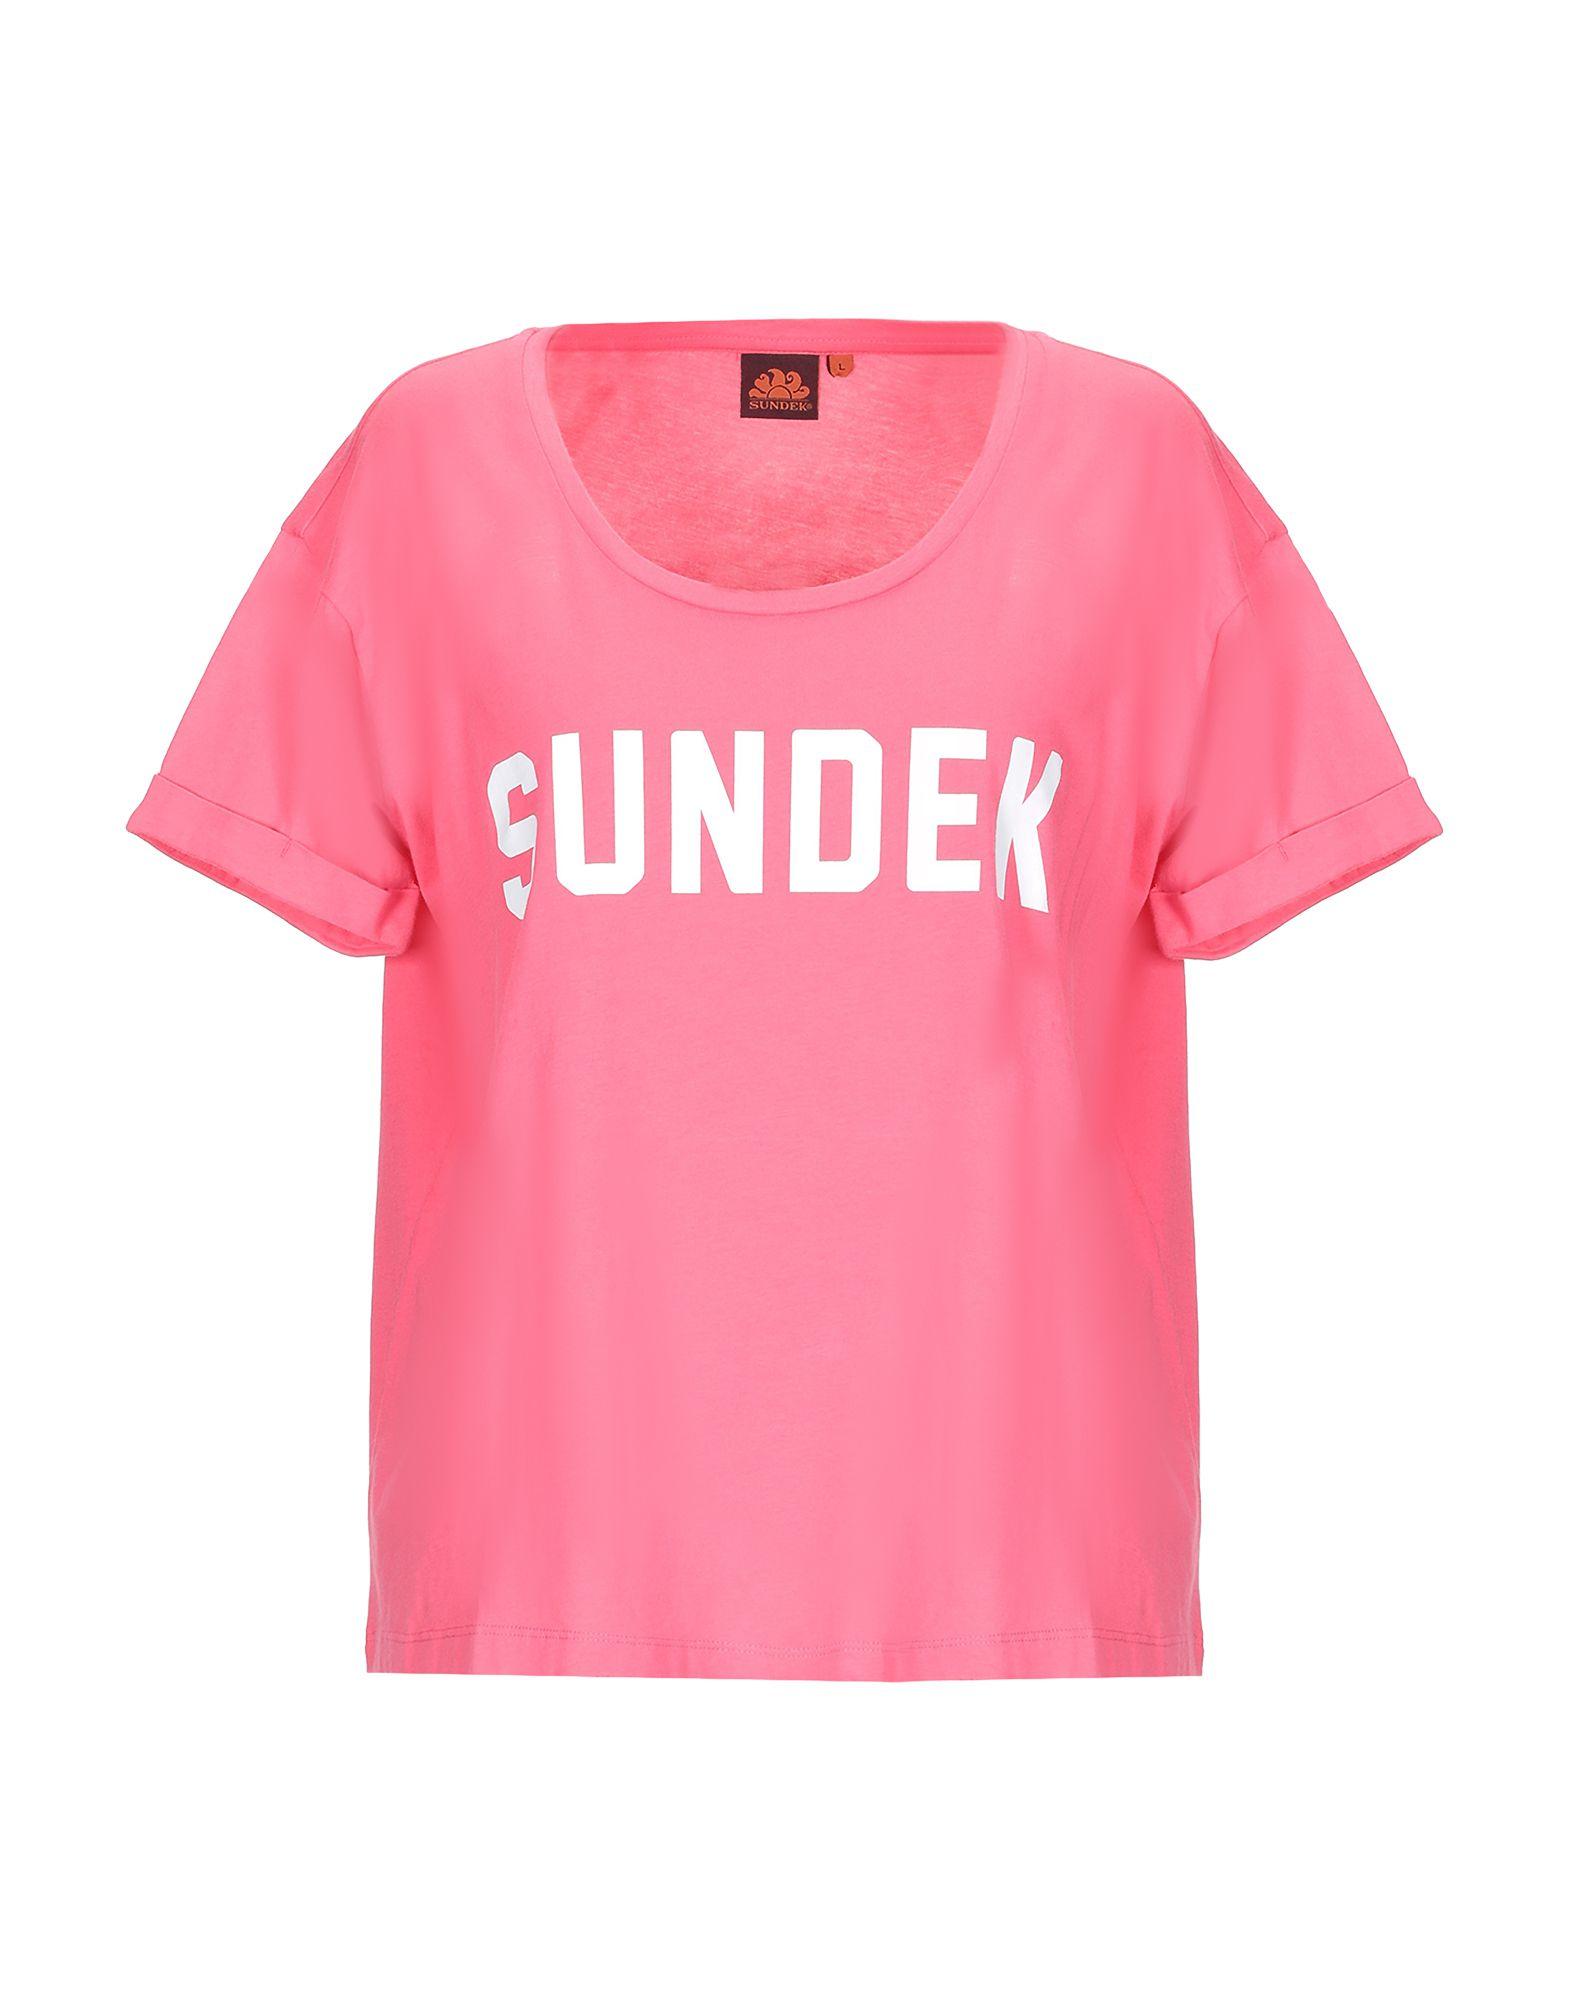 T-Shirt Sundek donna - - 12272717TT